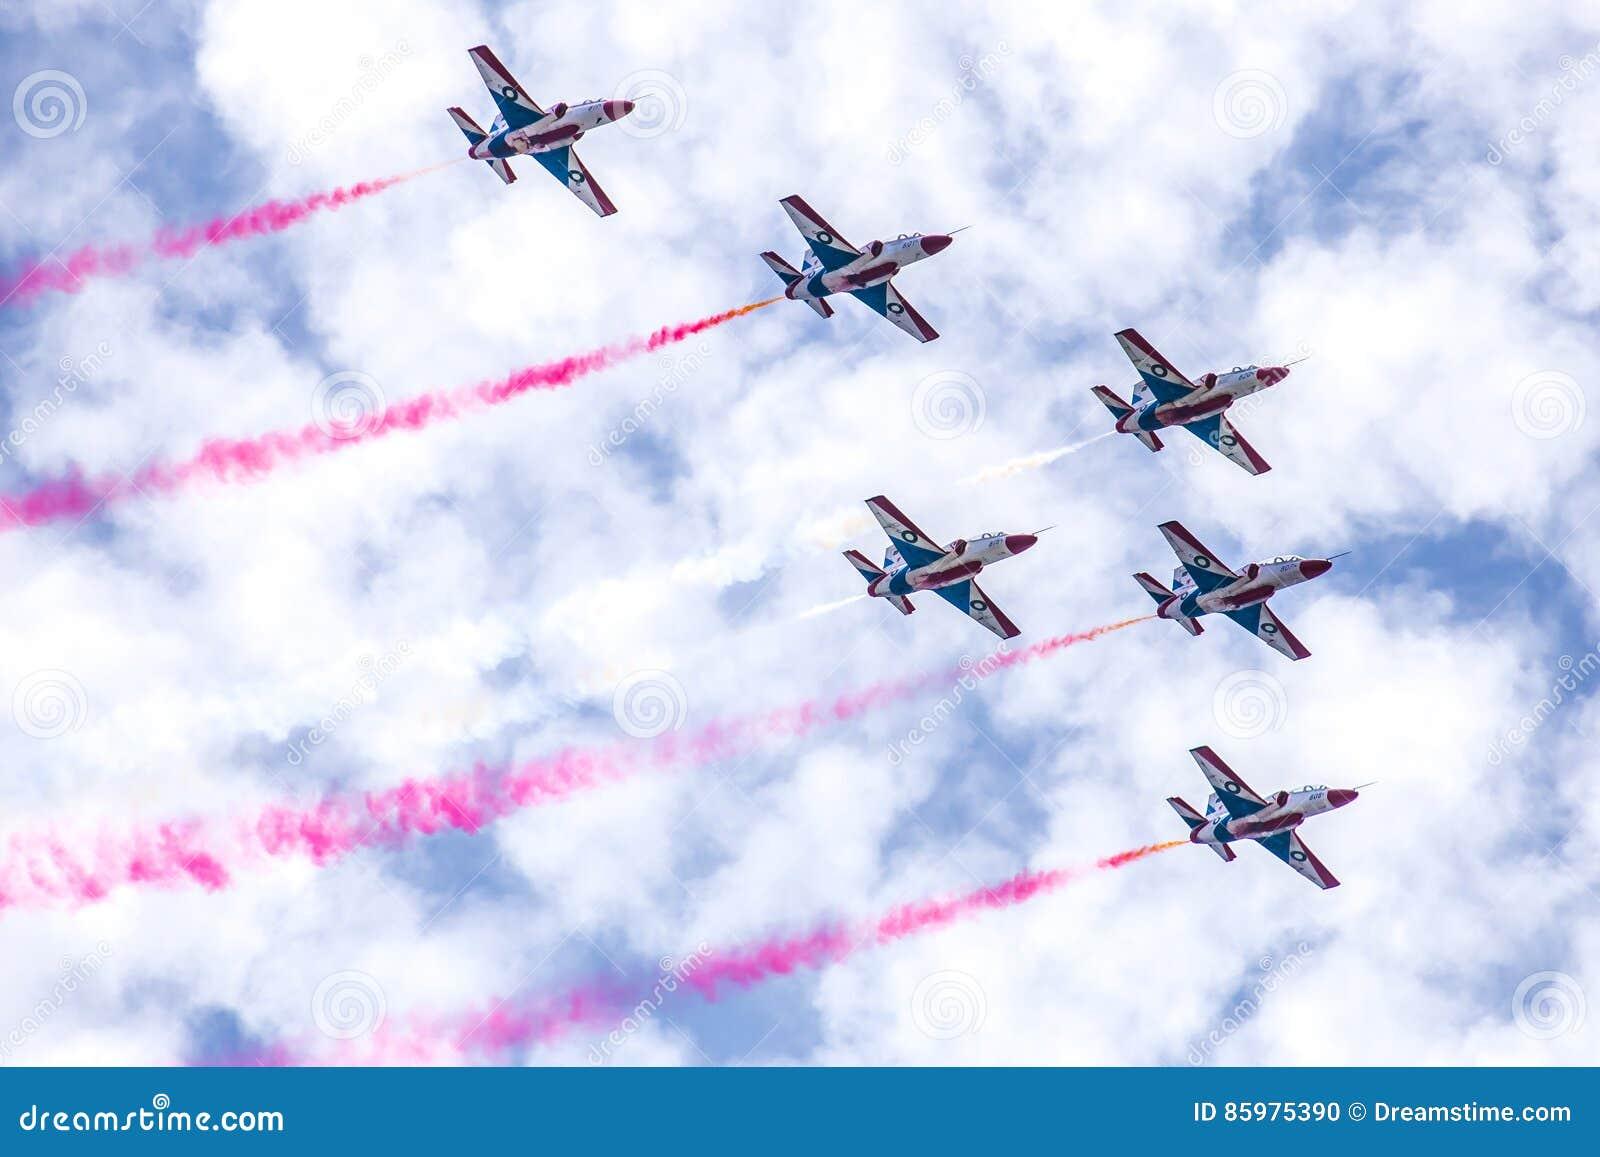 PAF K-8, Hongdu JL-8/, Sherdils Aerobatics Zespalają się, Islamabad, Pakistan